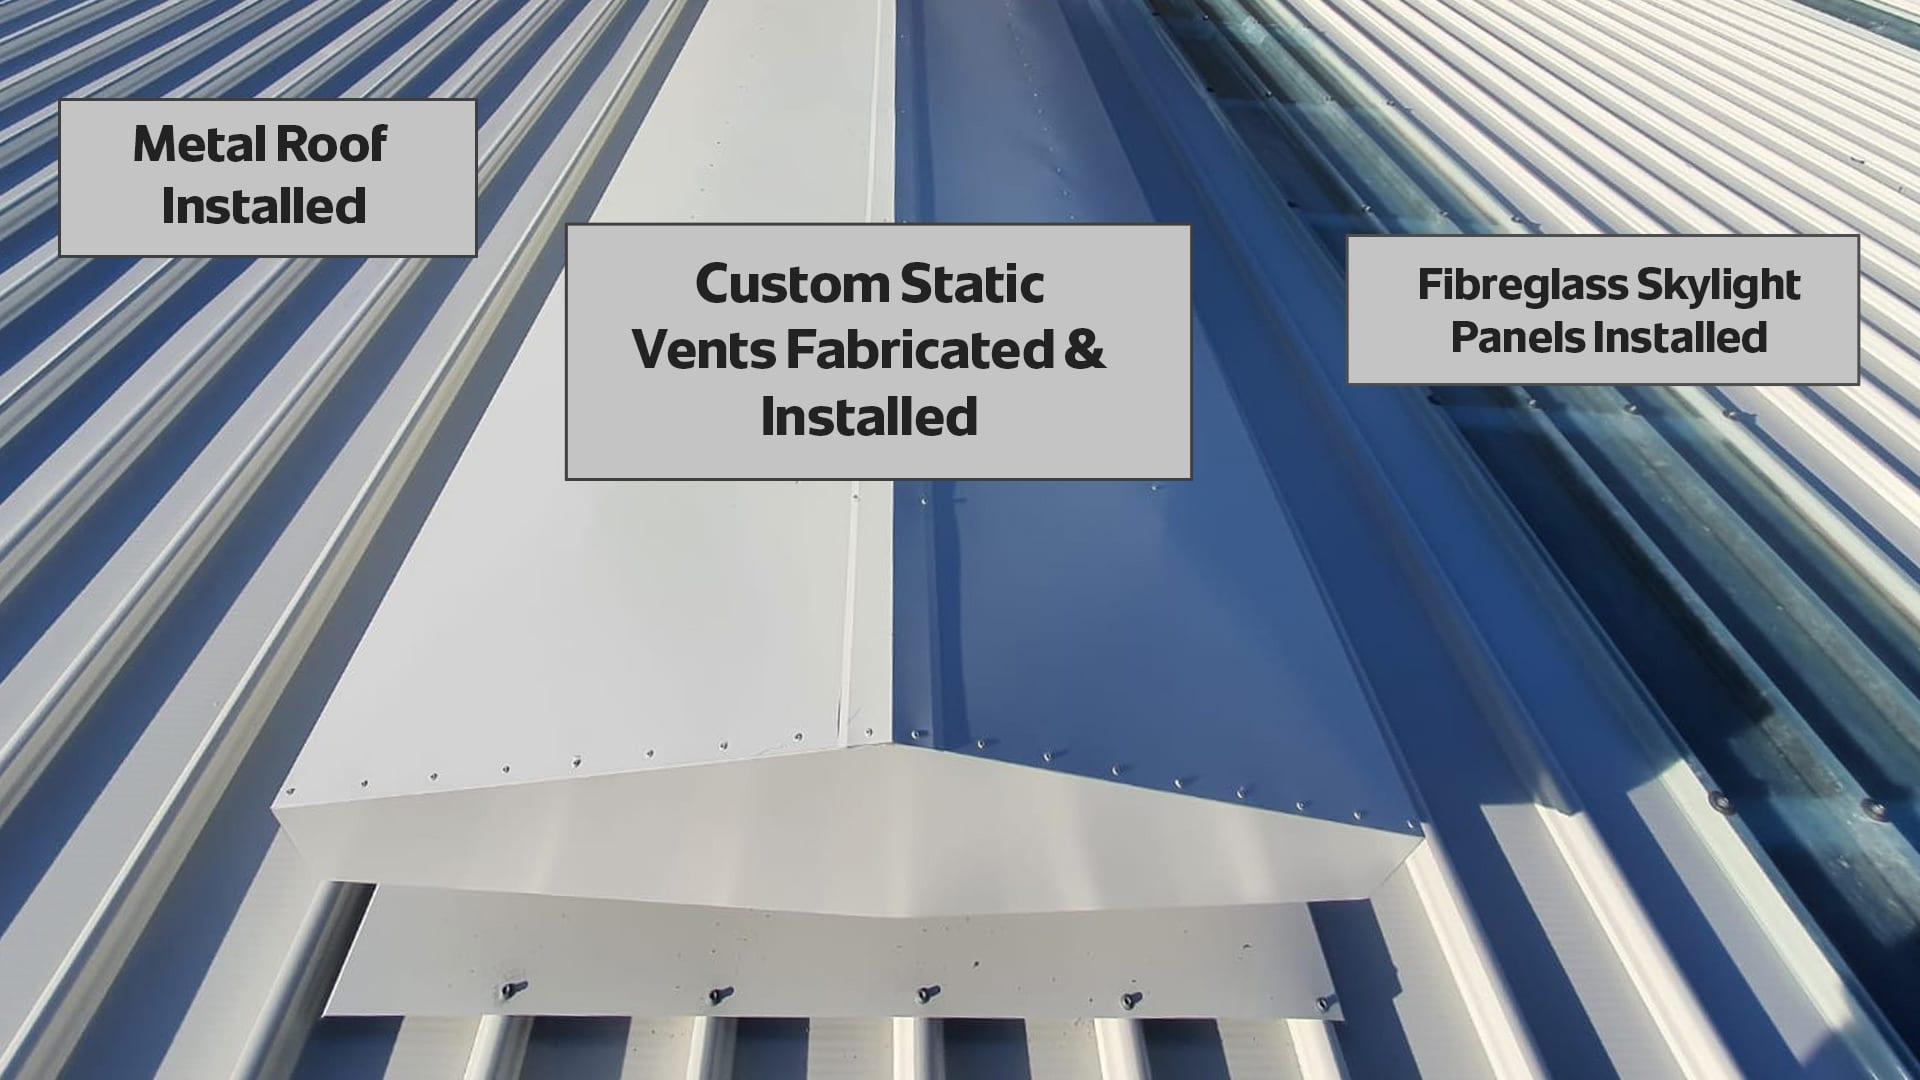 custom-fabrication-commercial-metal-roof-installation-sydney-australia